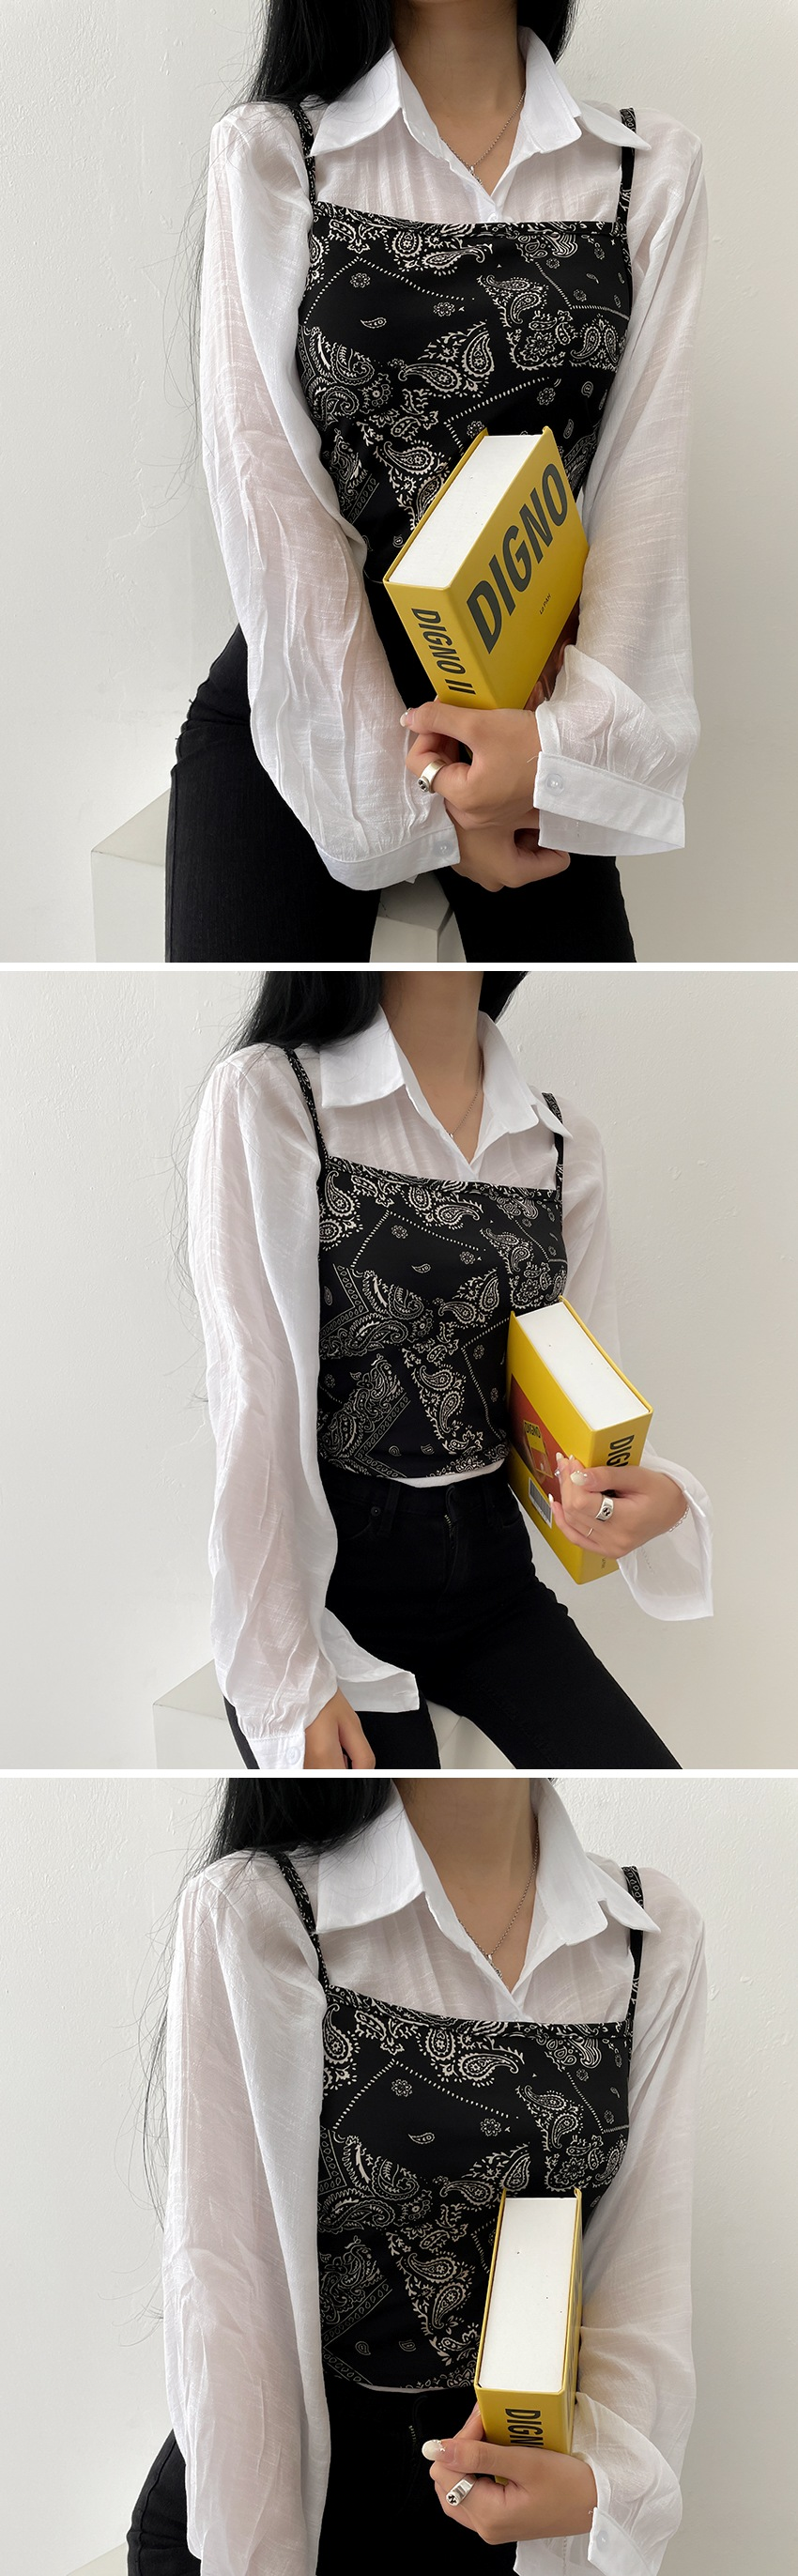 Paisley Bustier Bandana Scarf Wrap Top Sleeveless 3color